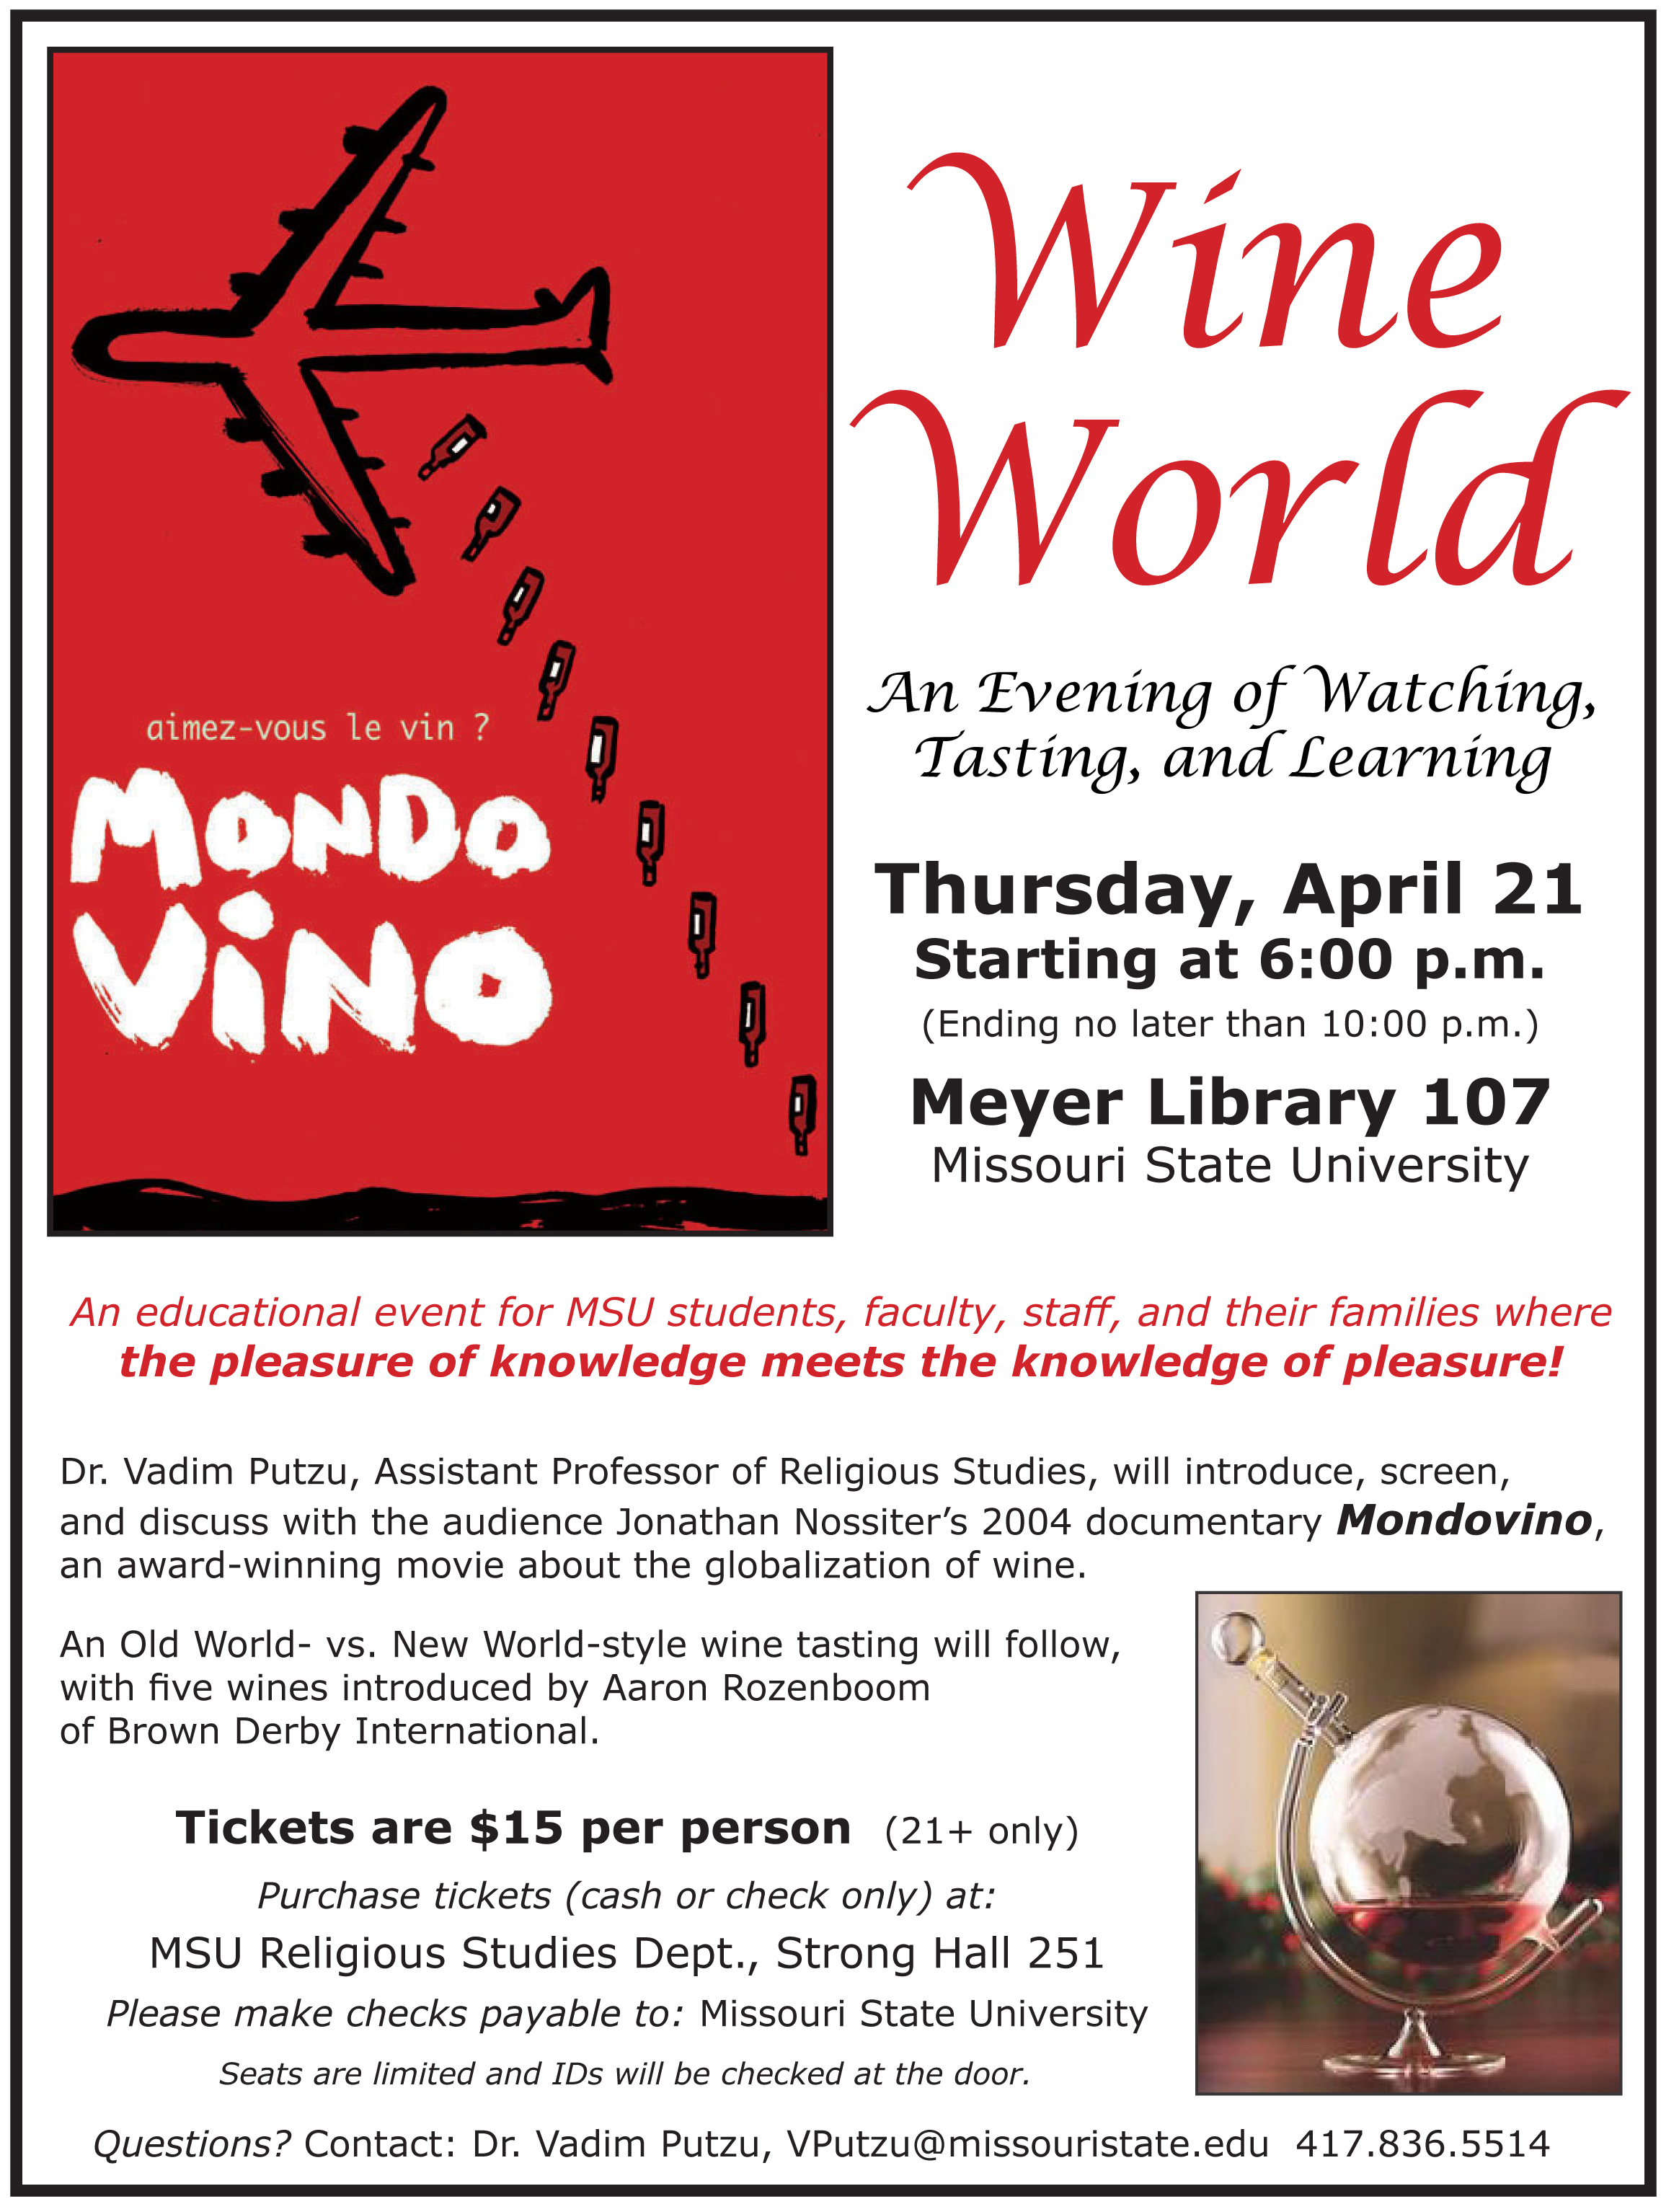 WineWorld: Movie and Wine Tasting Event!